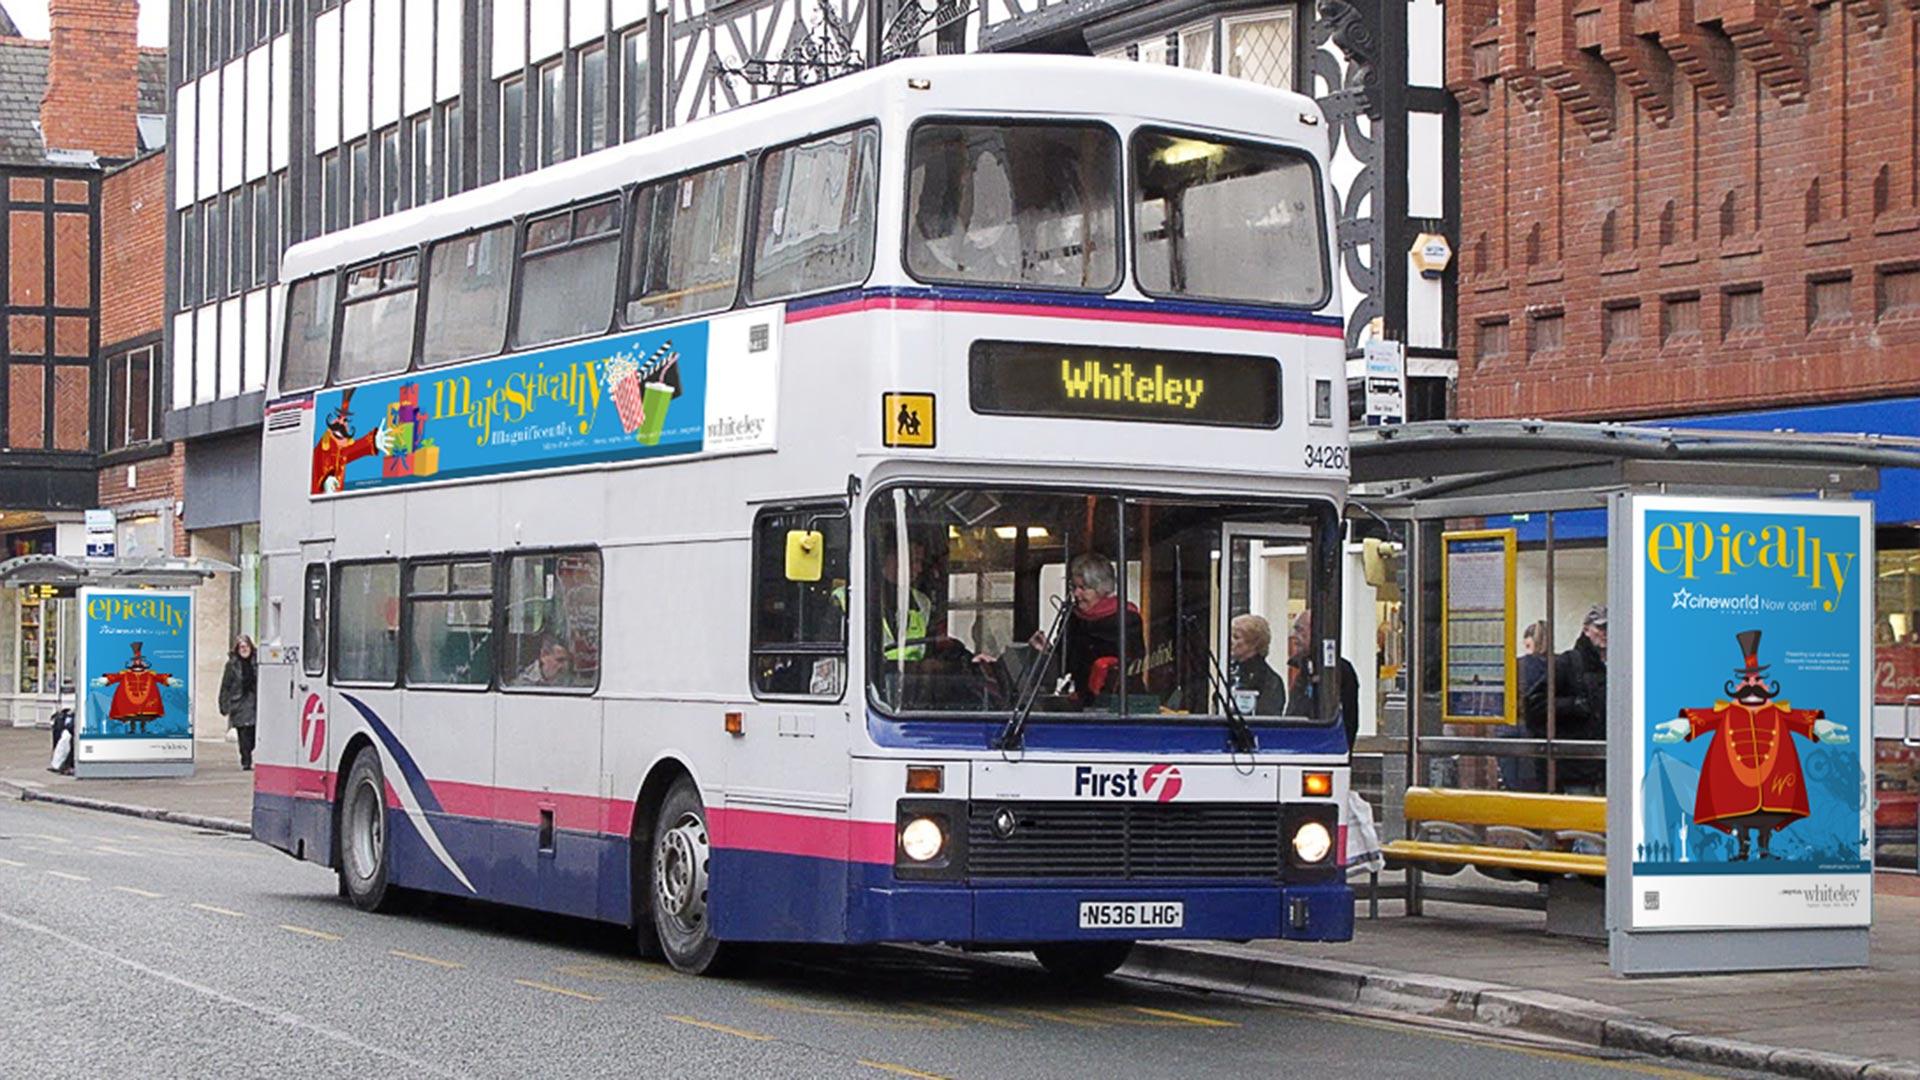 Whiteley Cinema launch Bus side